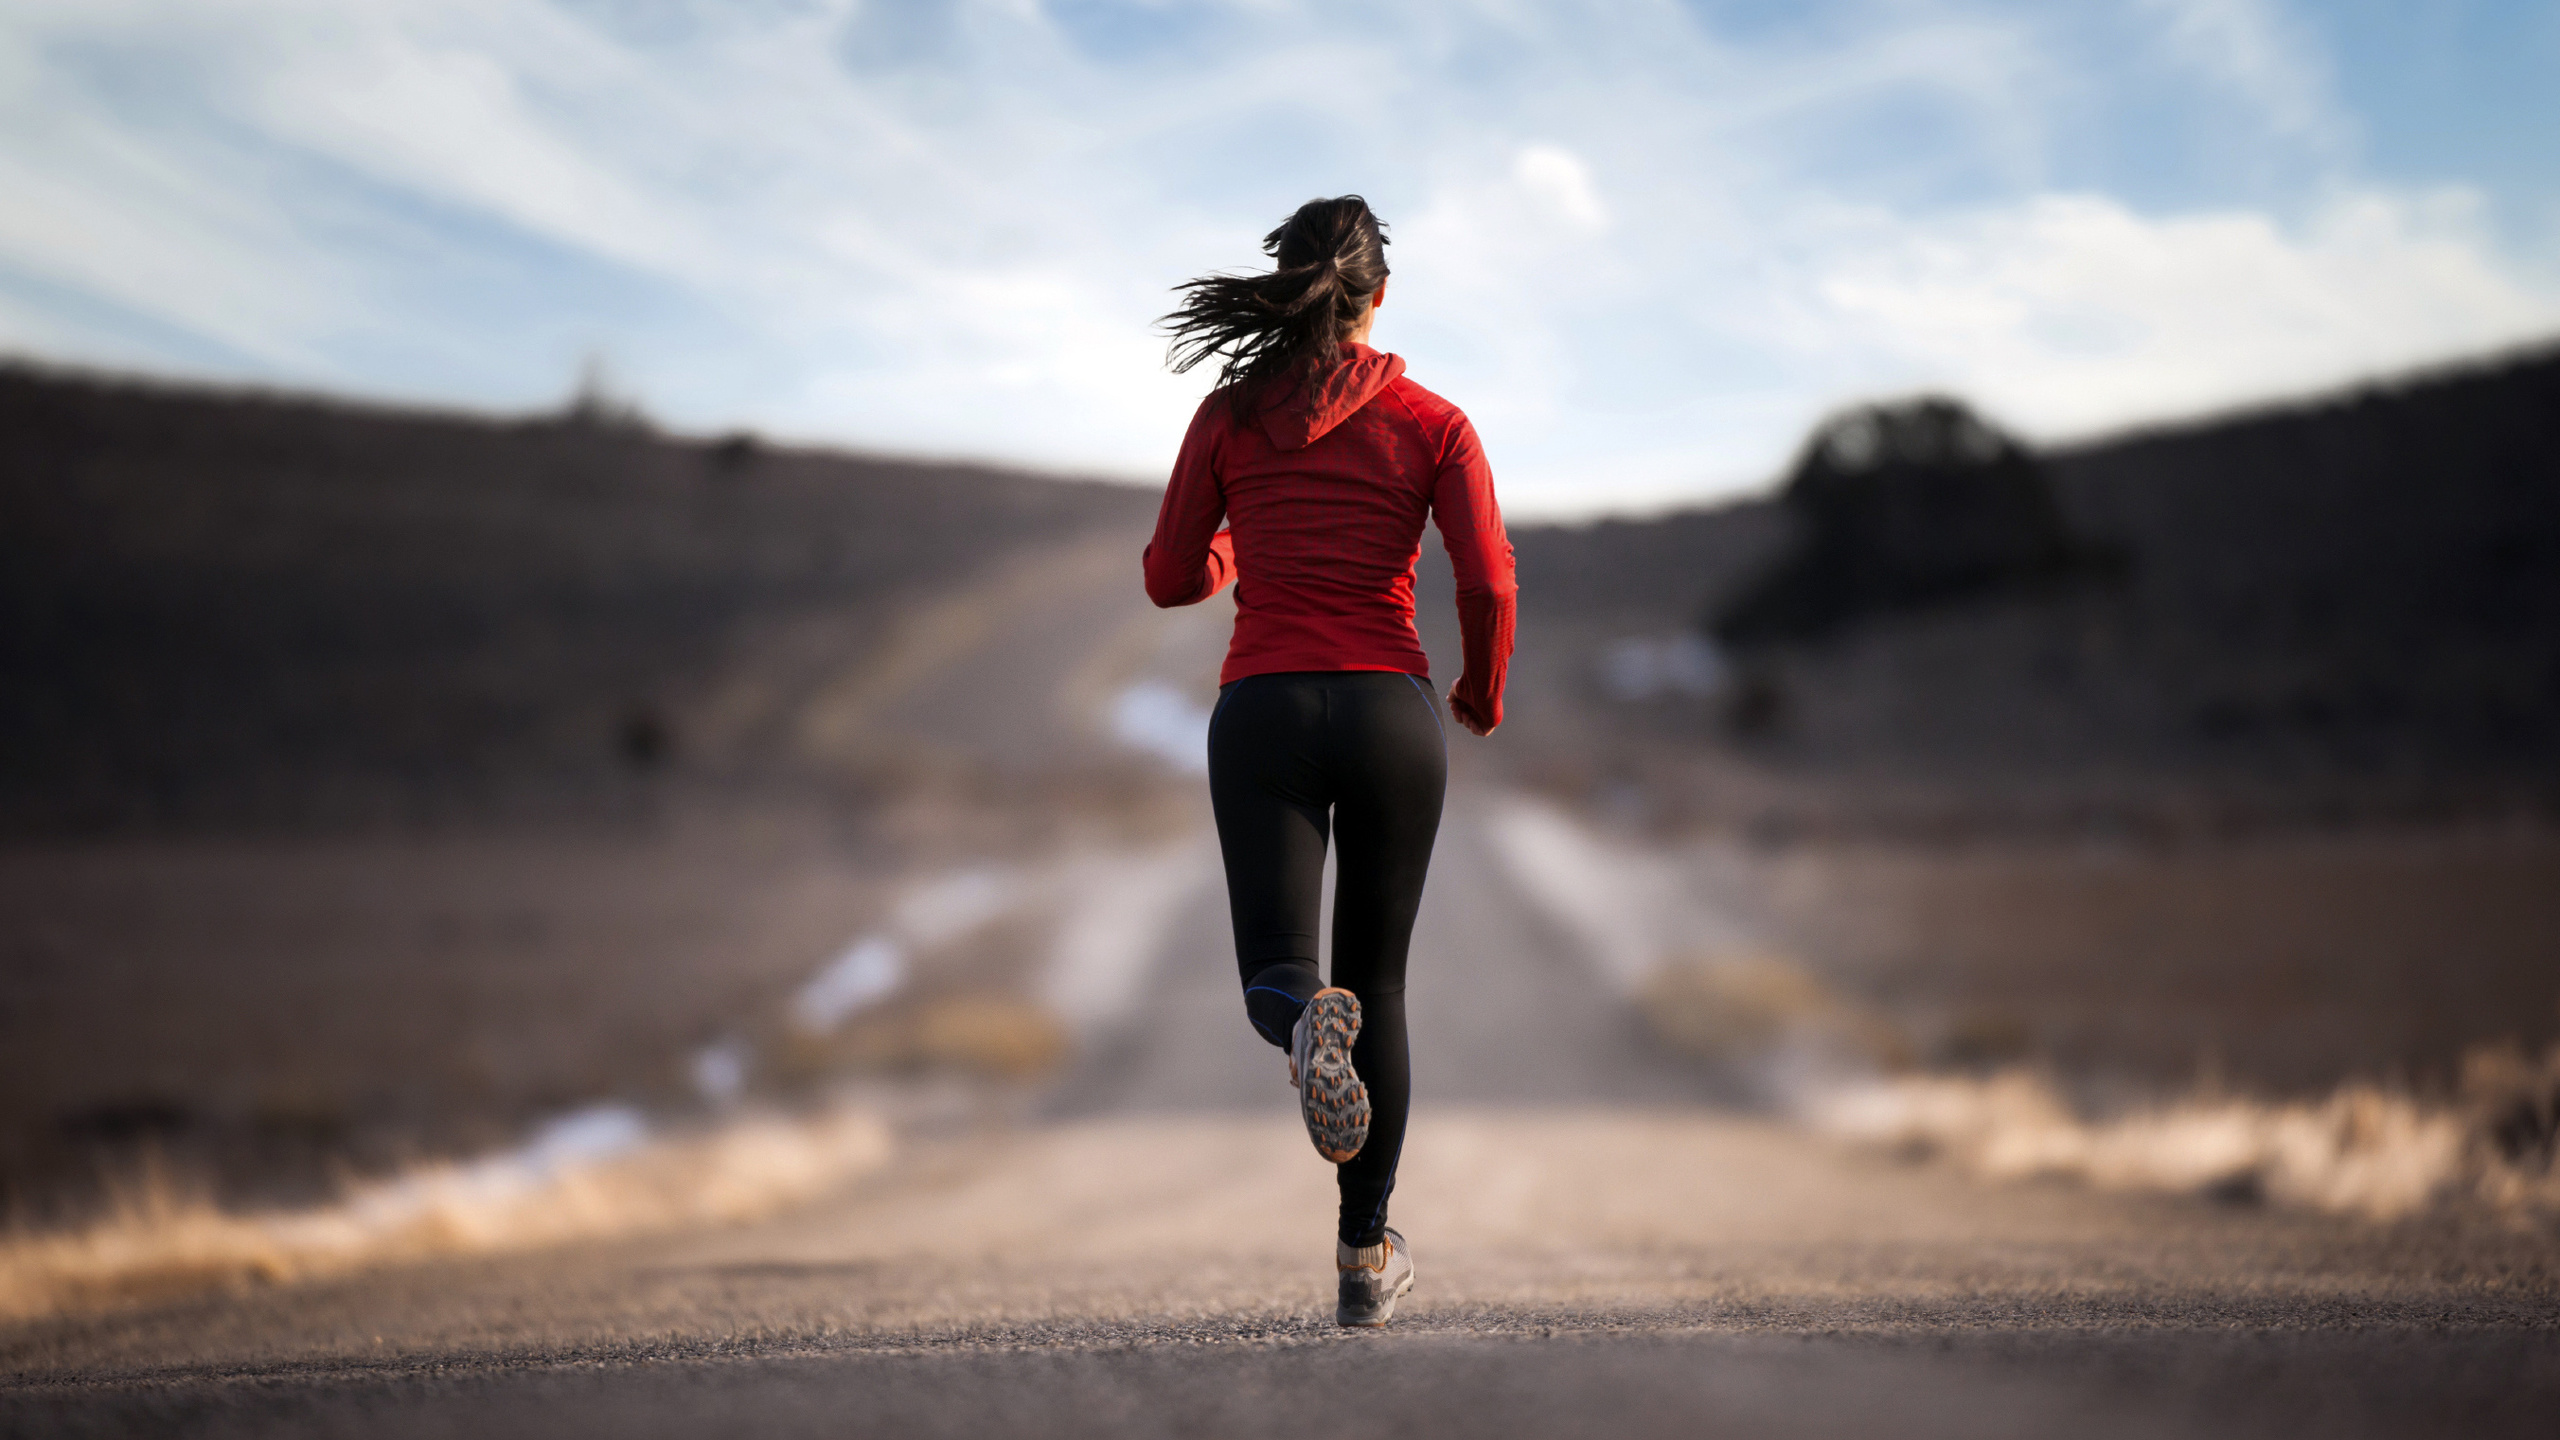 Мотиваторы здоровье картинки